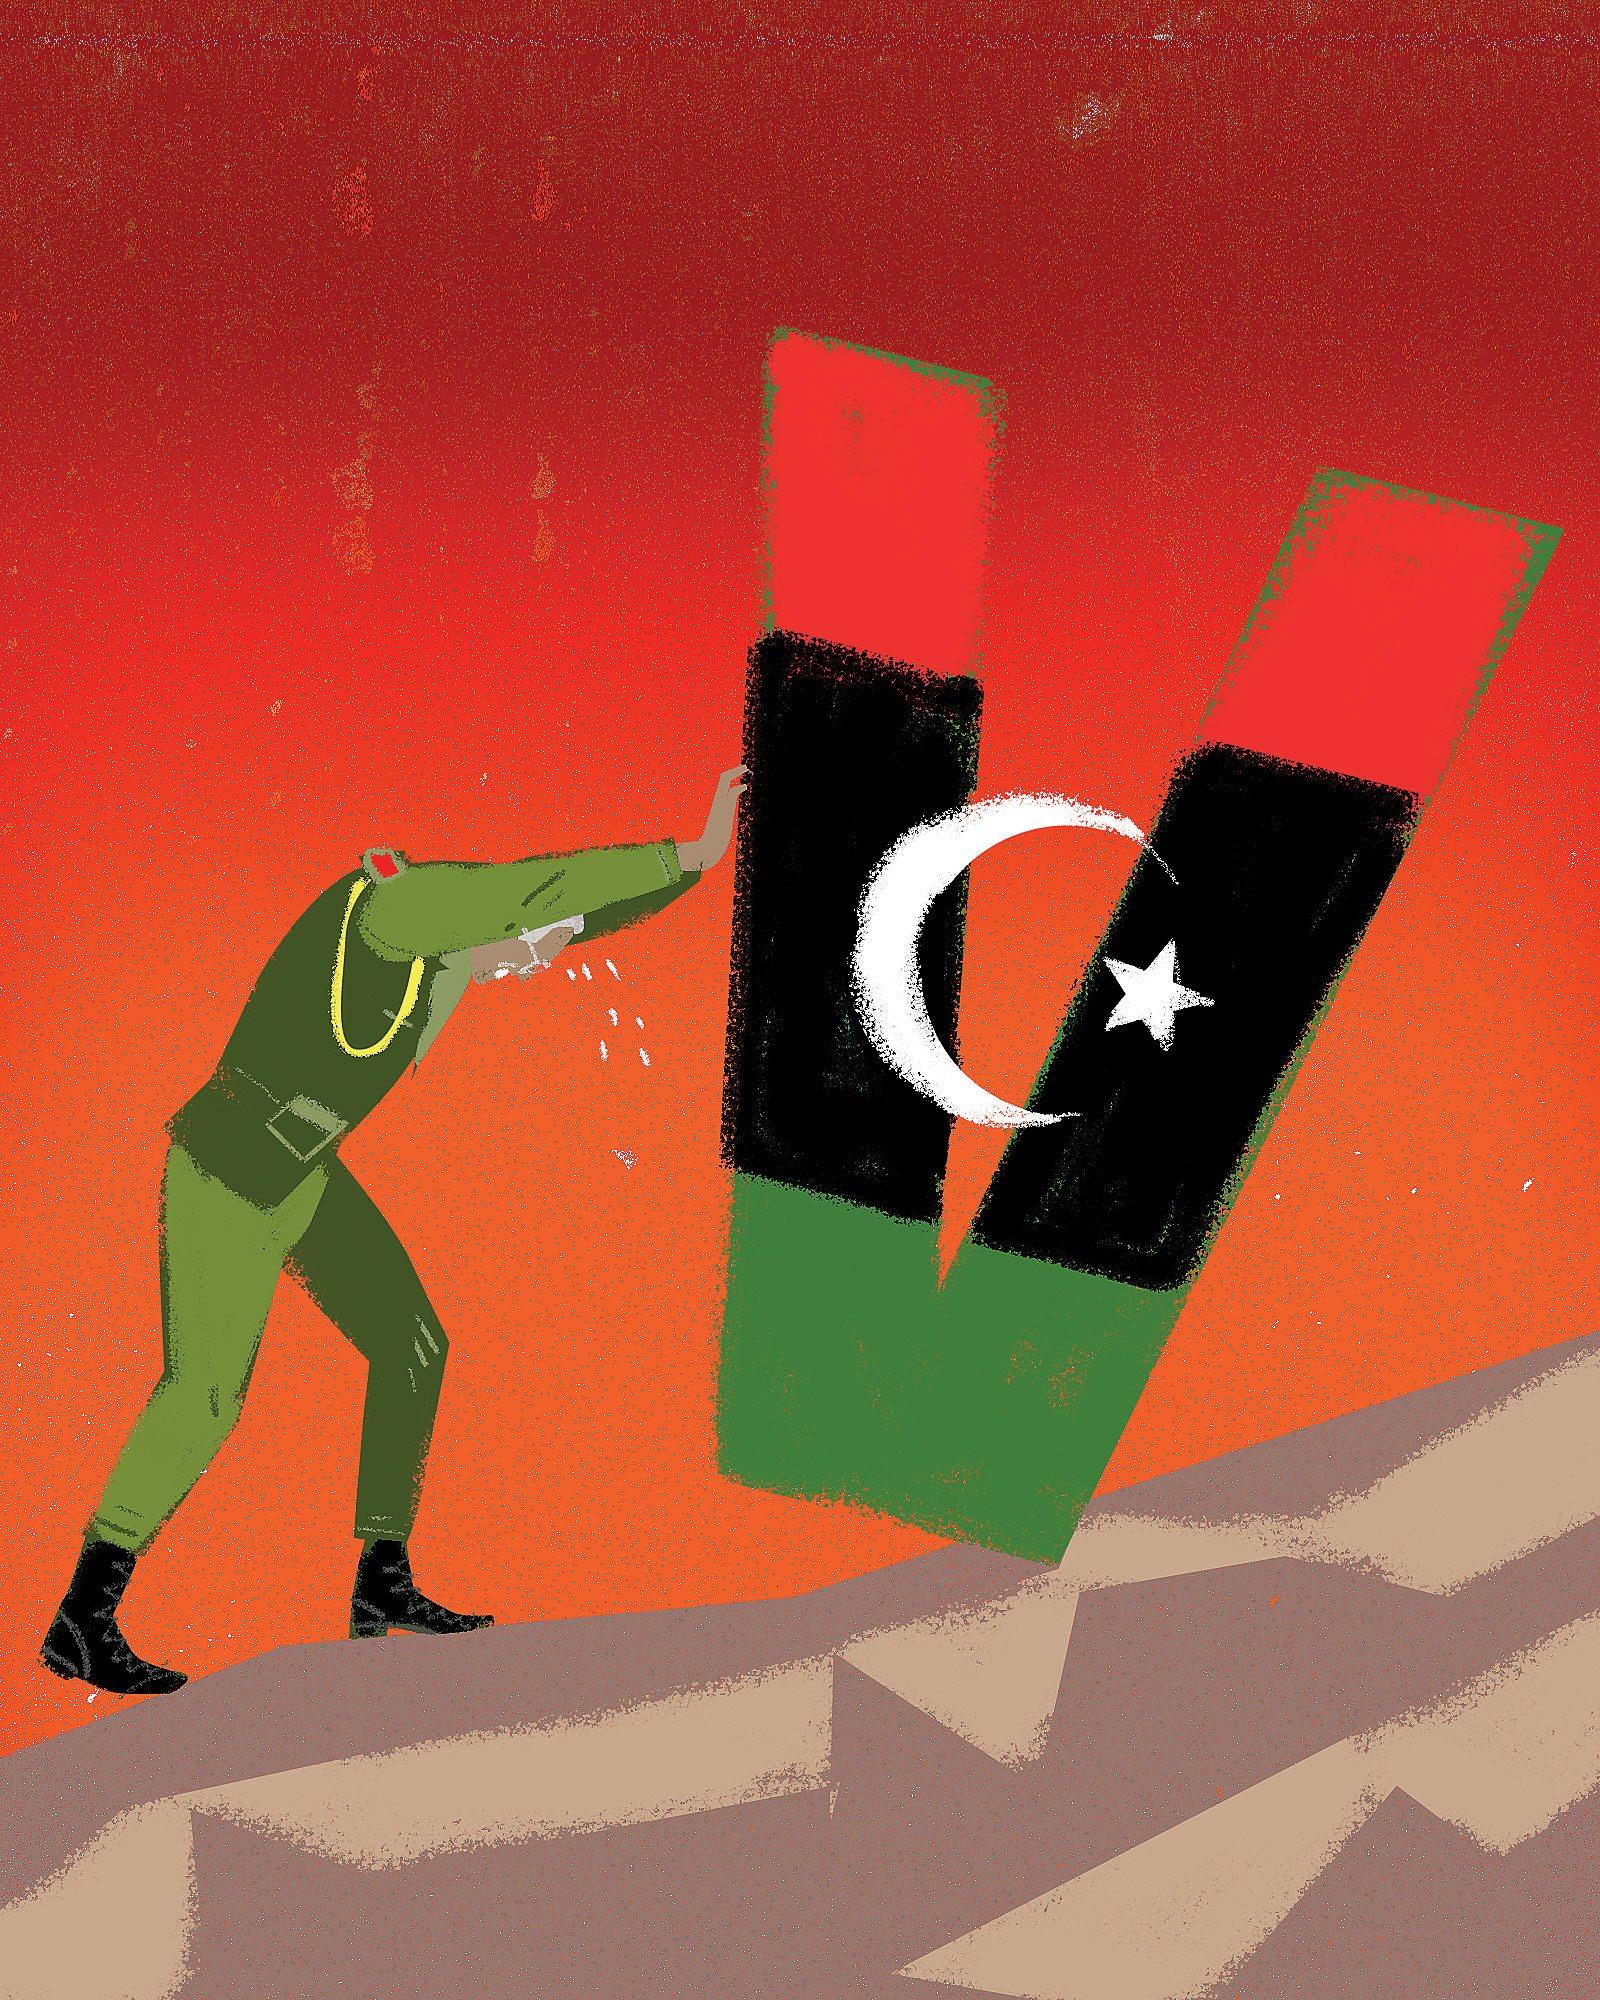 Misplaced optimism in Libya